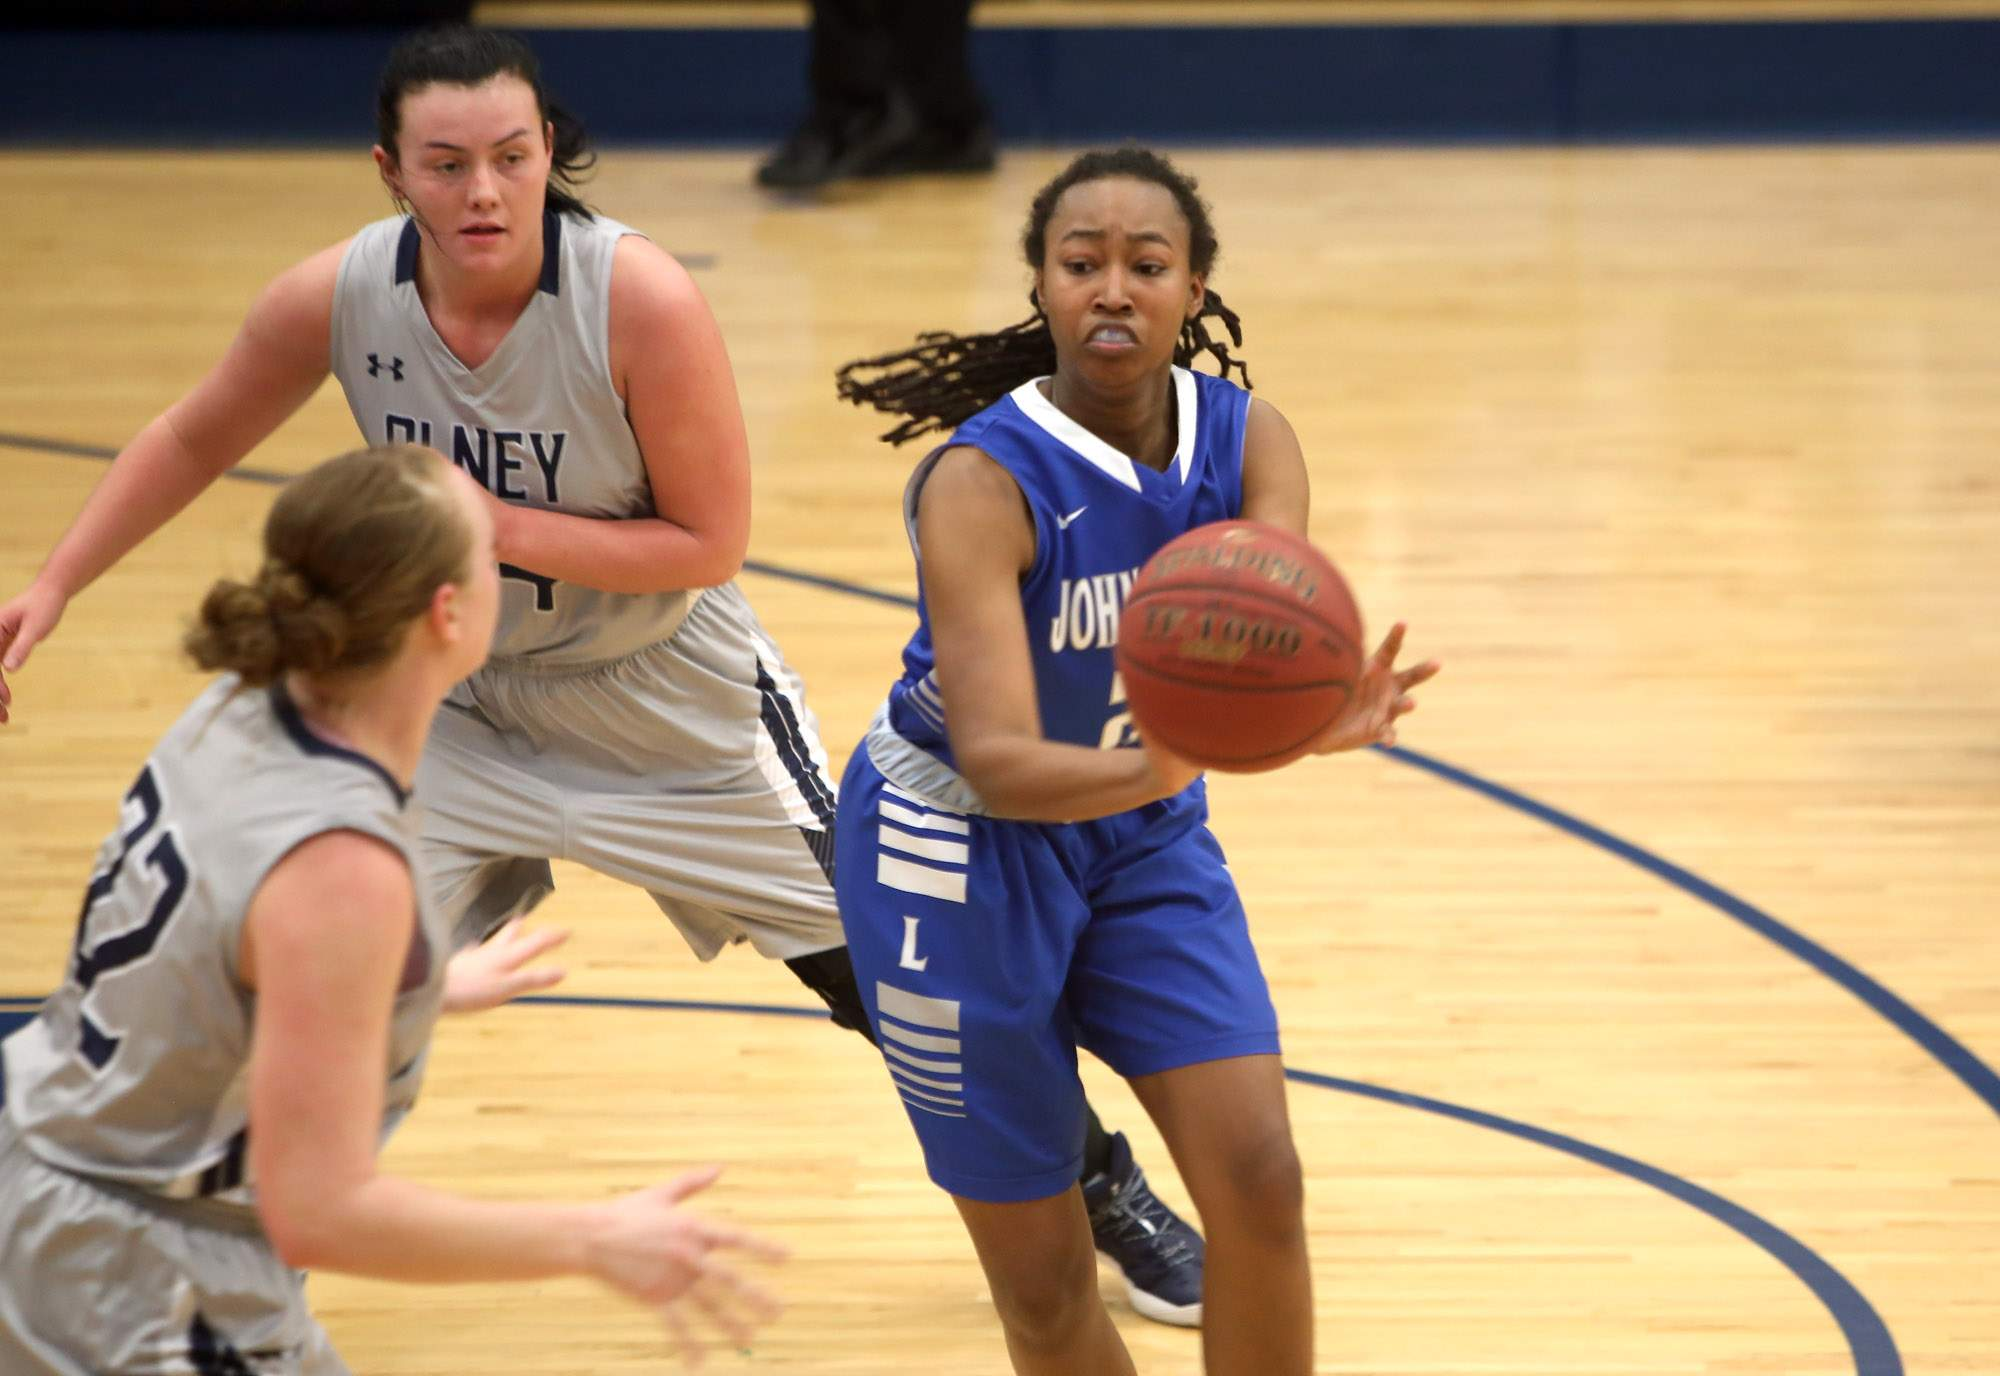 Miriah Donelson passes the ball.